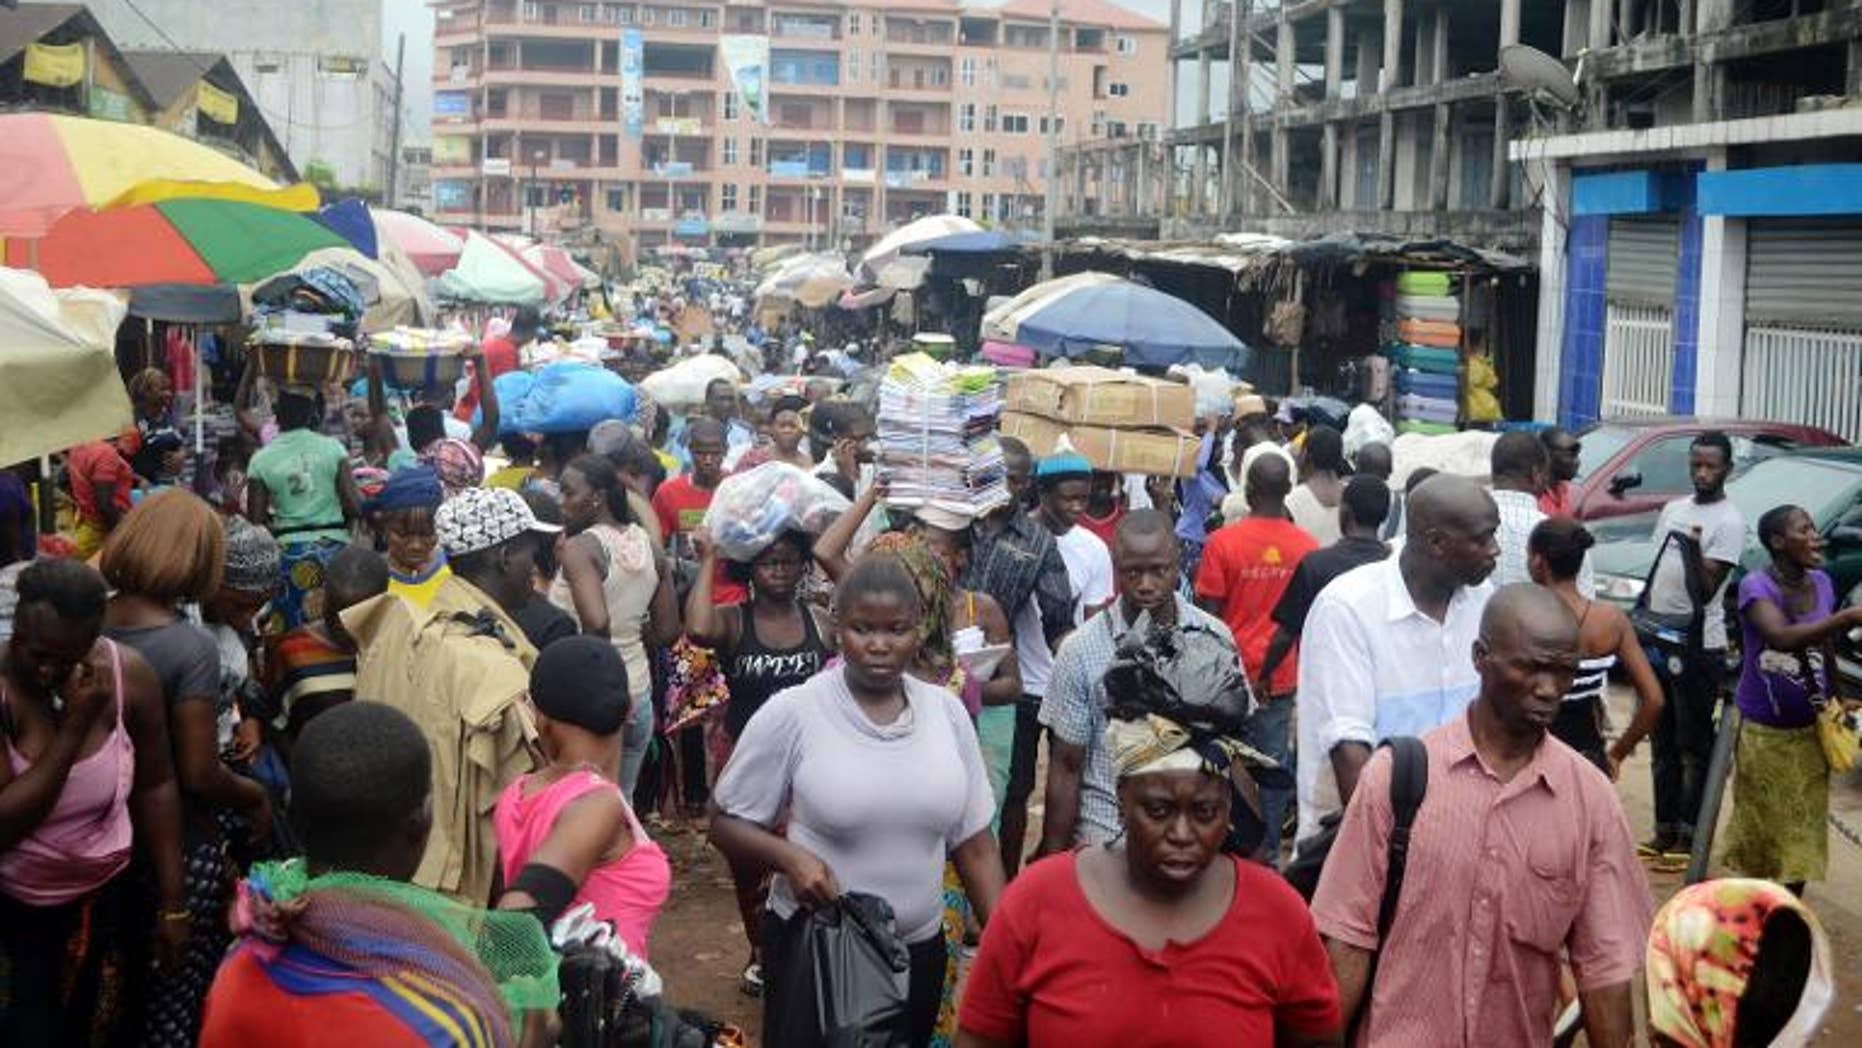 People walking in Conakry street, Guinea, September 24, 2013